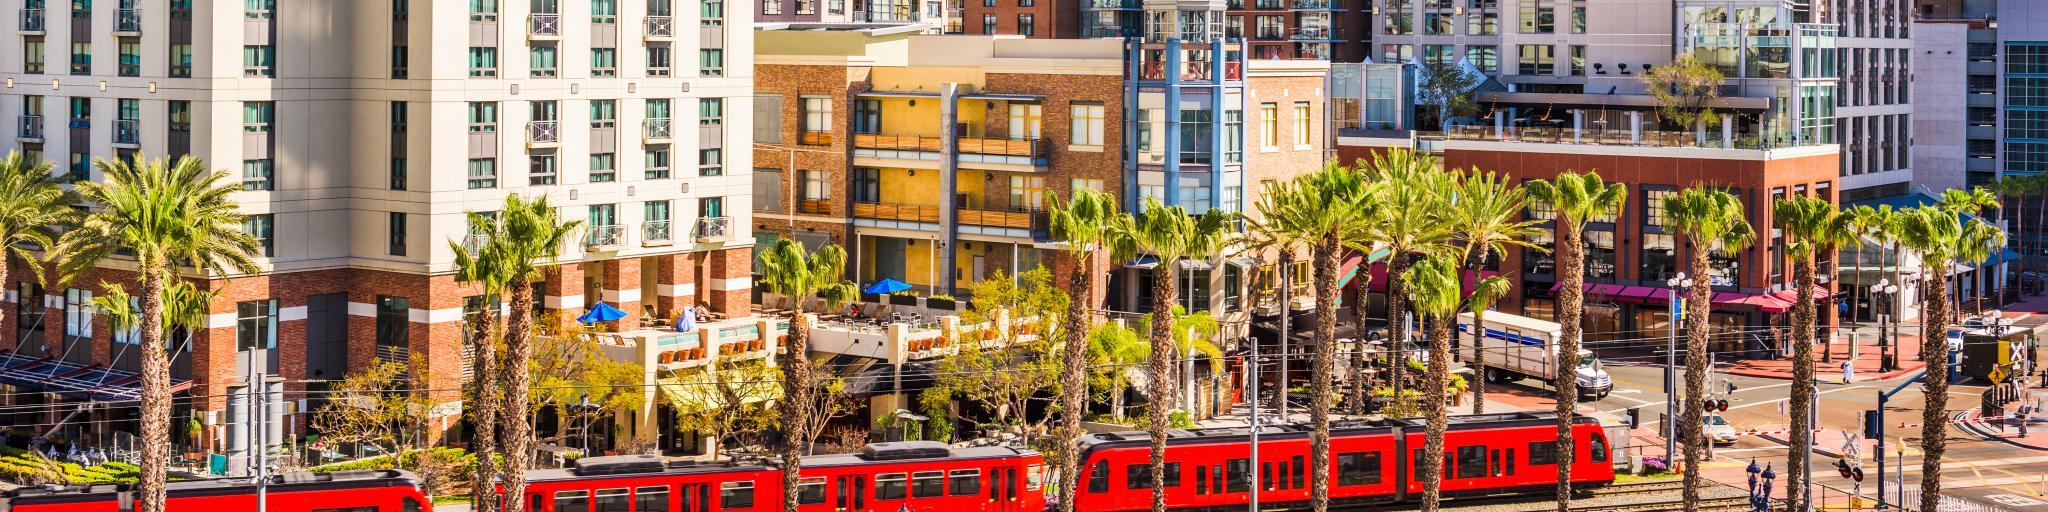 A classic red trolley in San Diego's Gaslamp neighborhood.